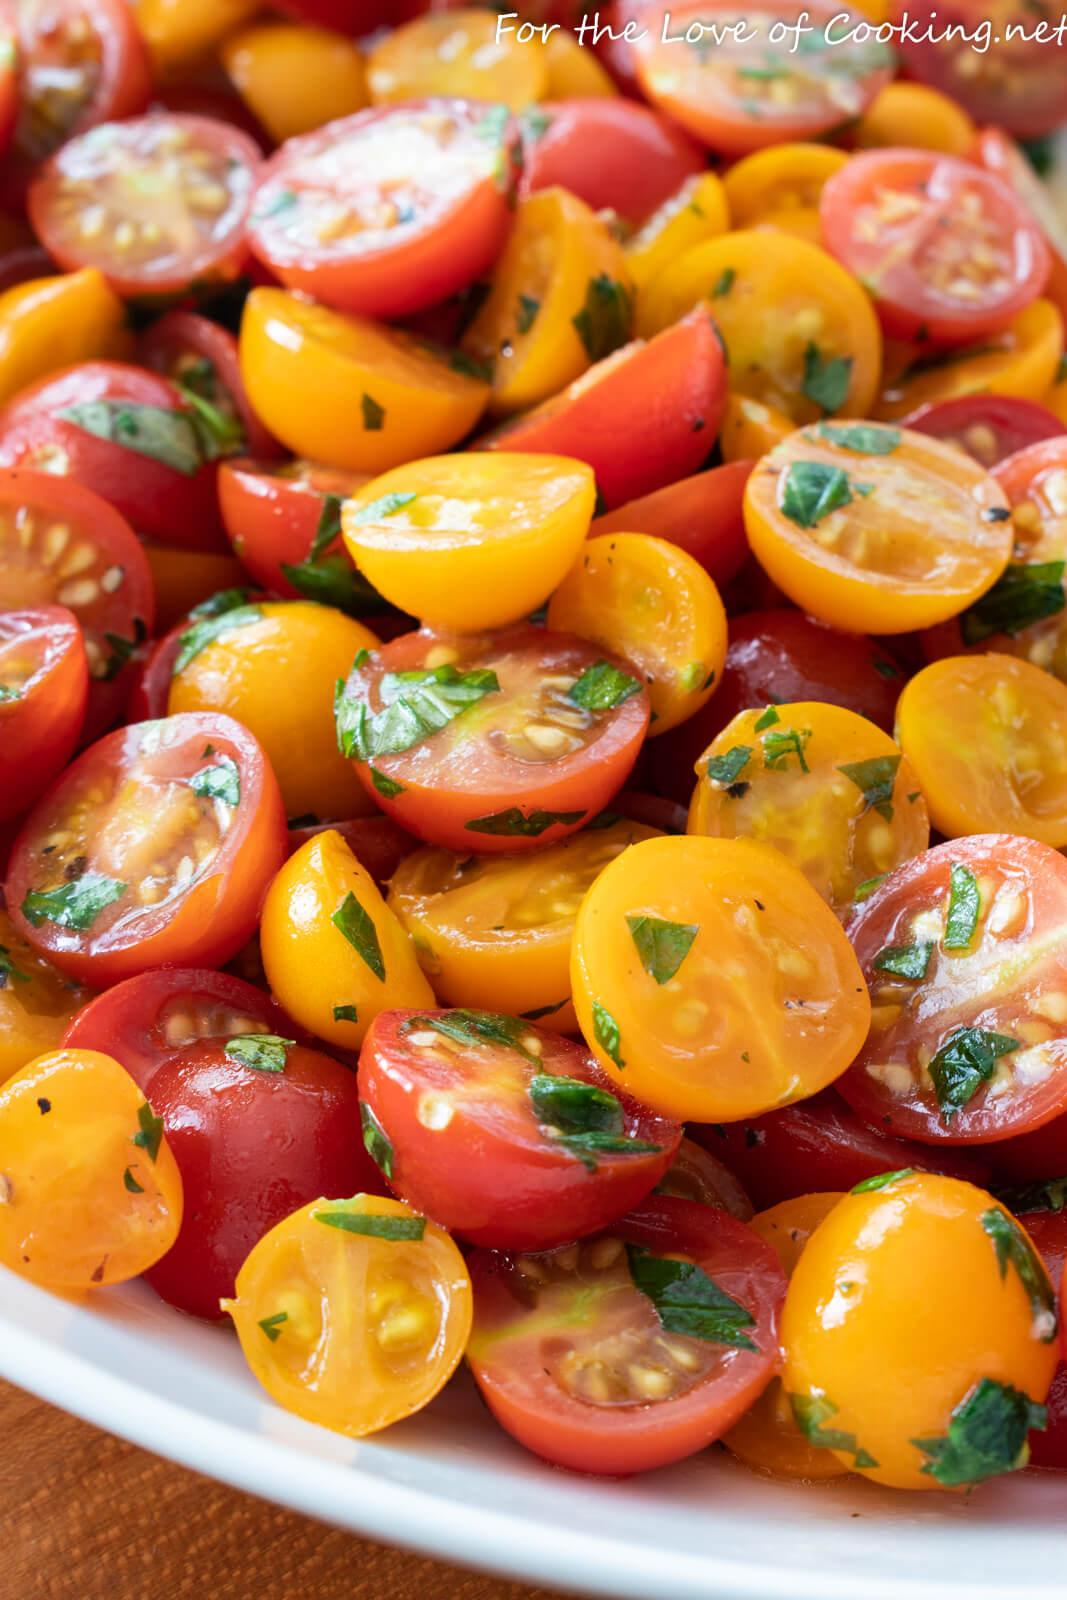 Marinated Cherry Tomatoes with Fresh Herbs